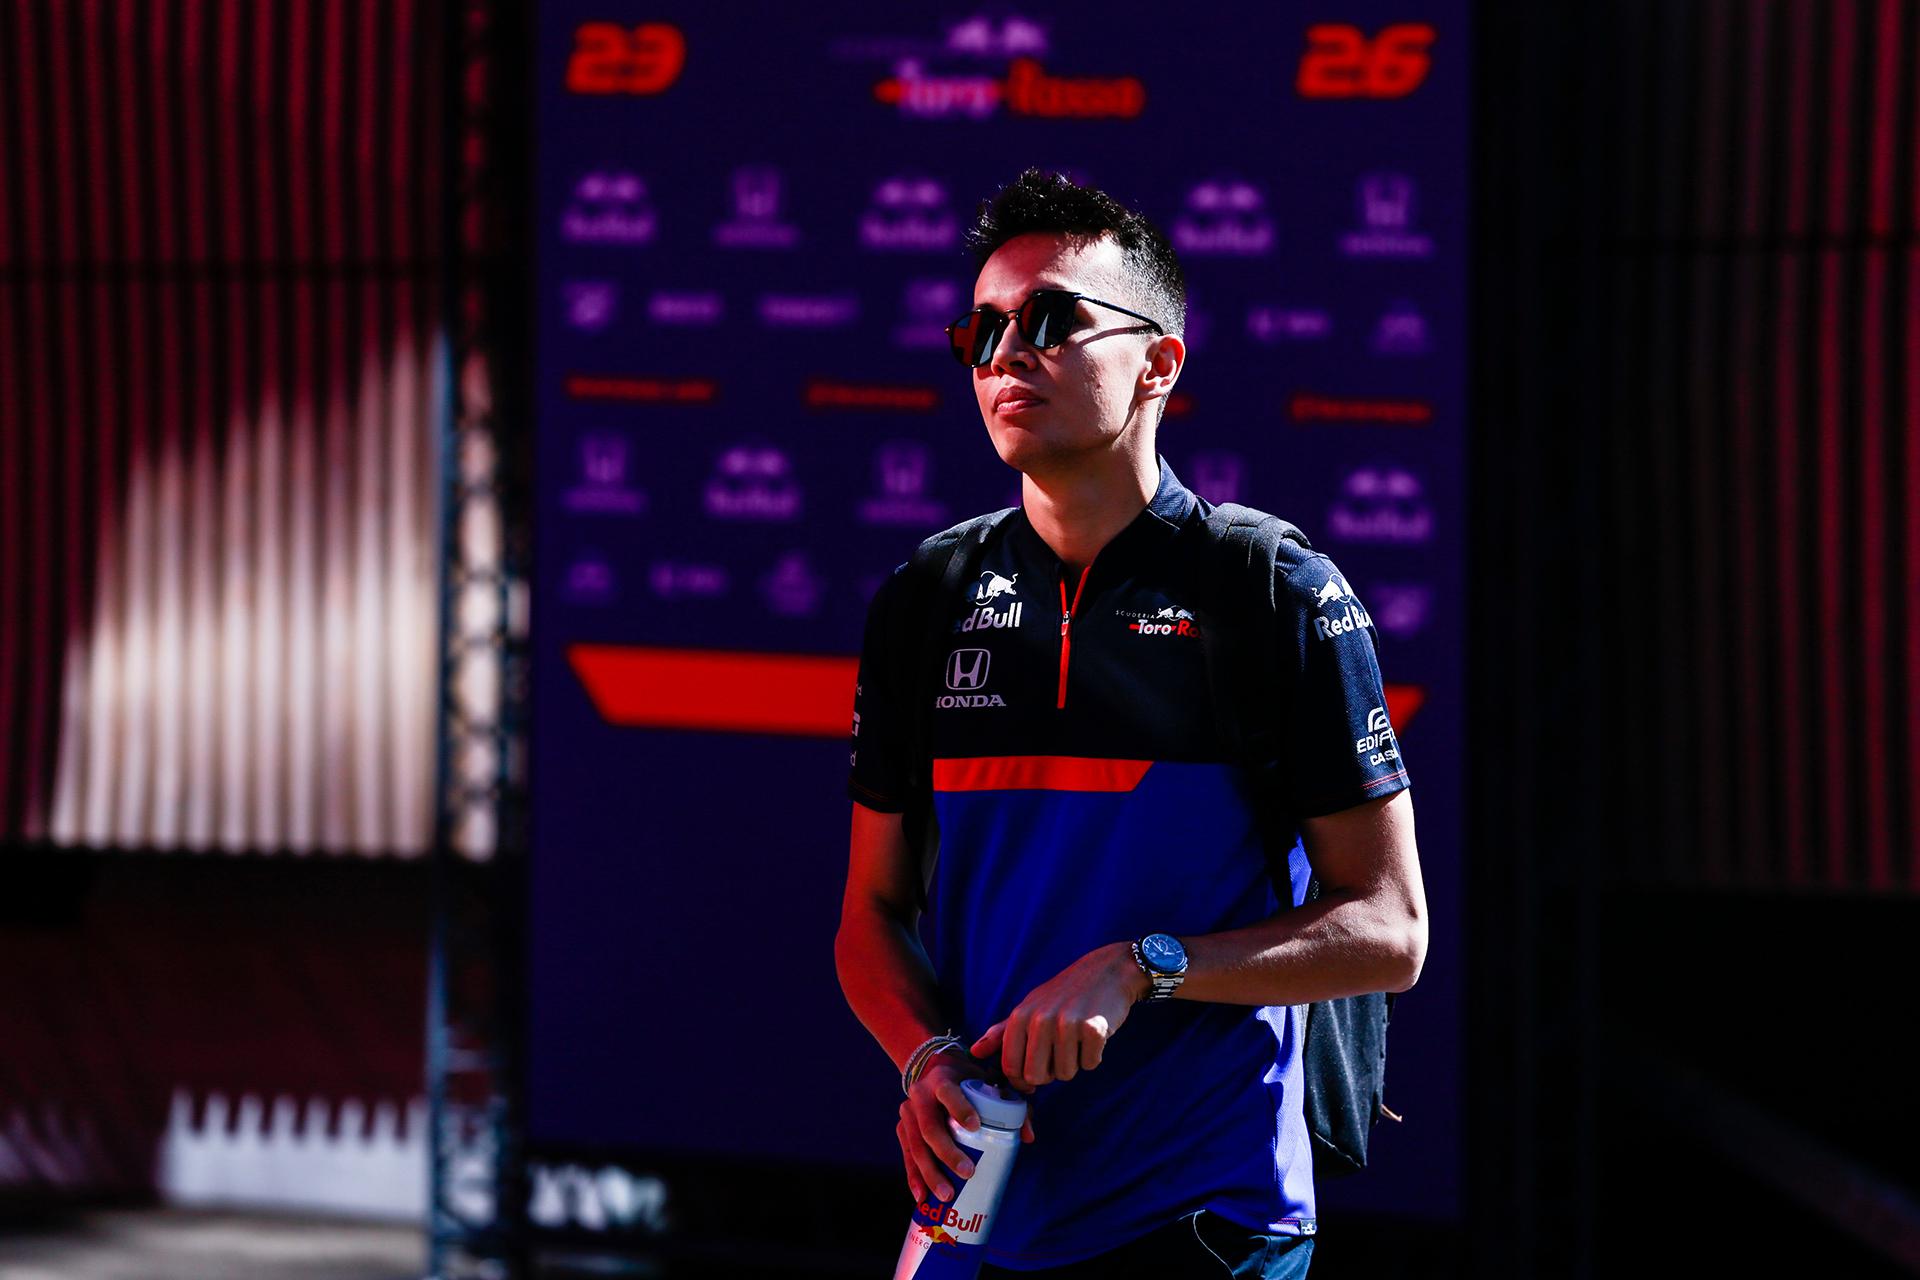 Alexander Albon (Toro Rosso Honda), USD 845.000